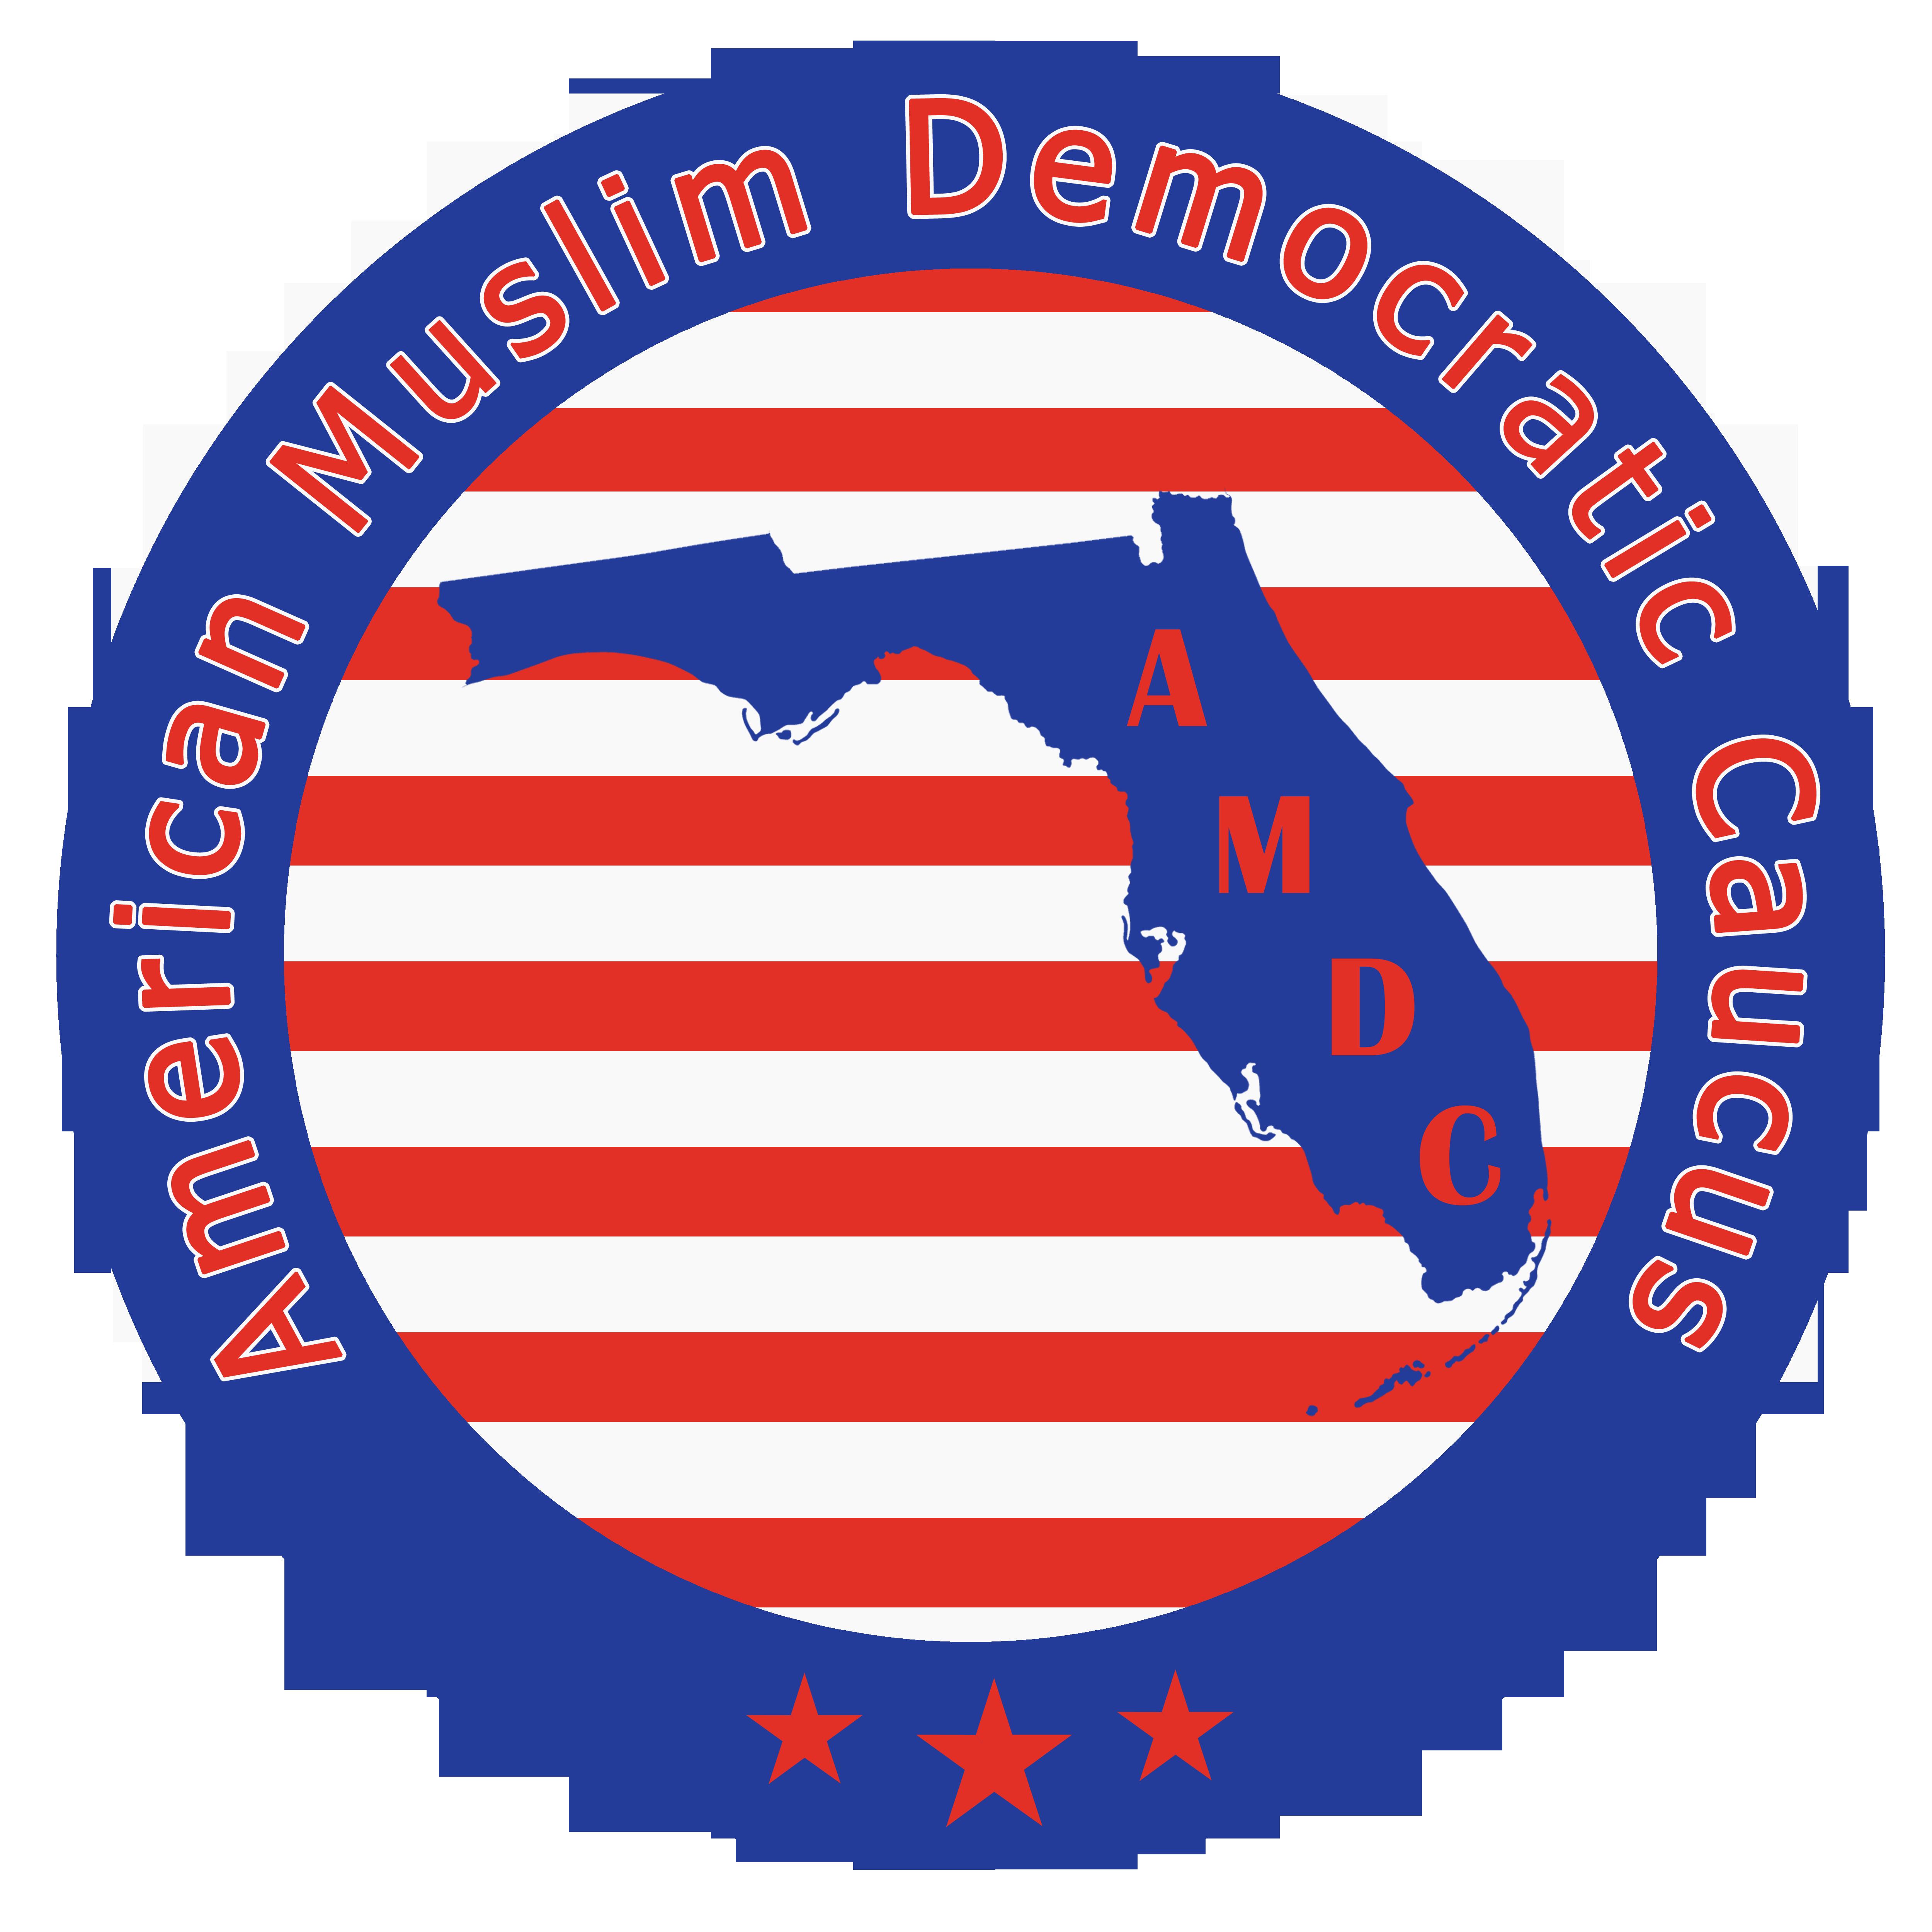 Democracy clipart caucus. Admin daylightsgraphics com author